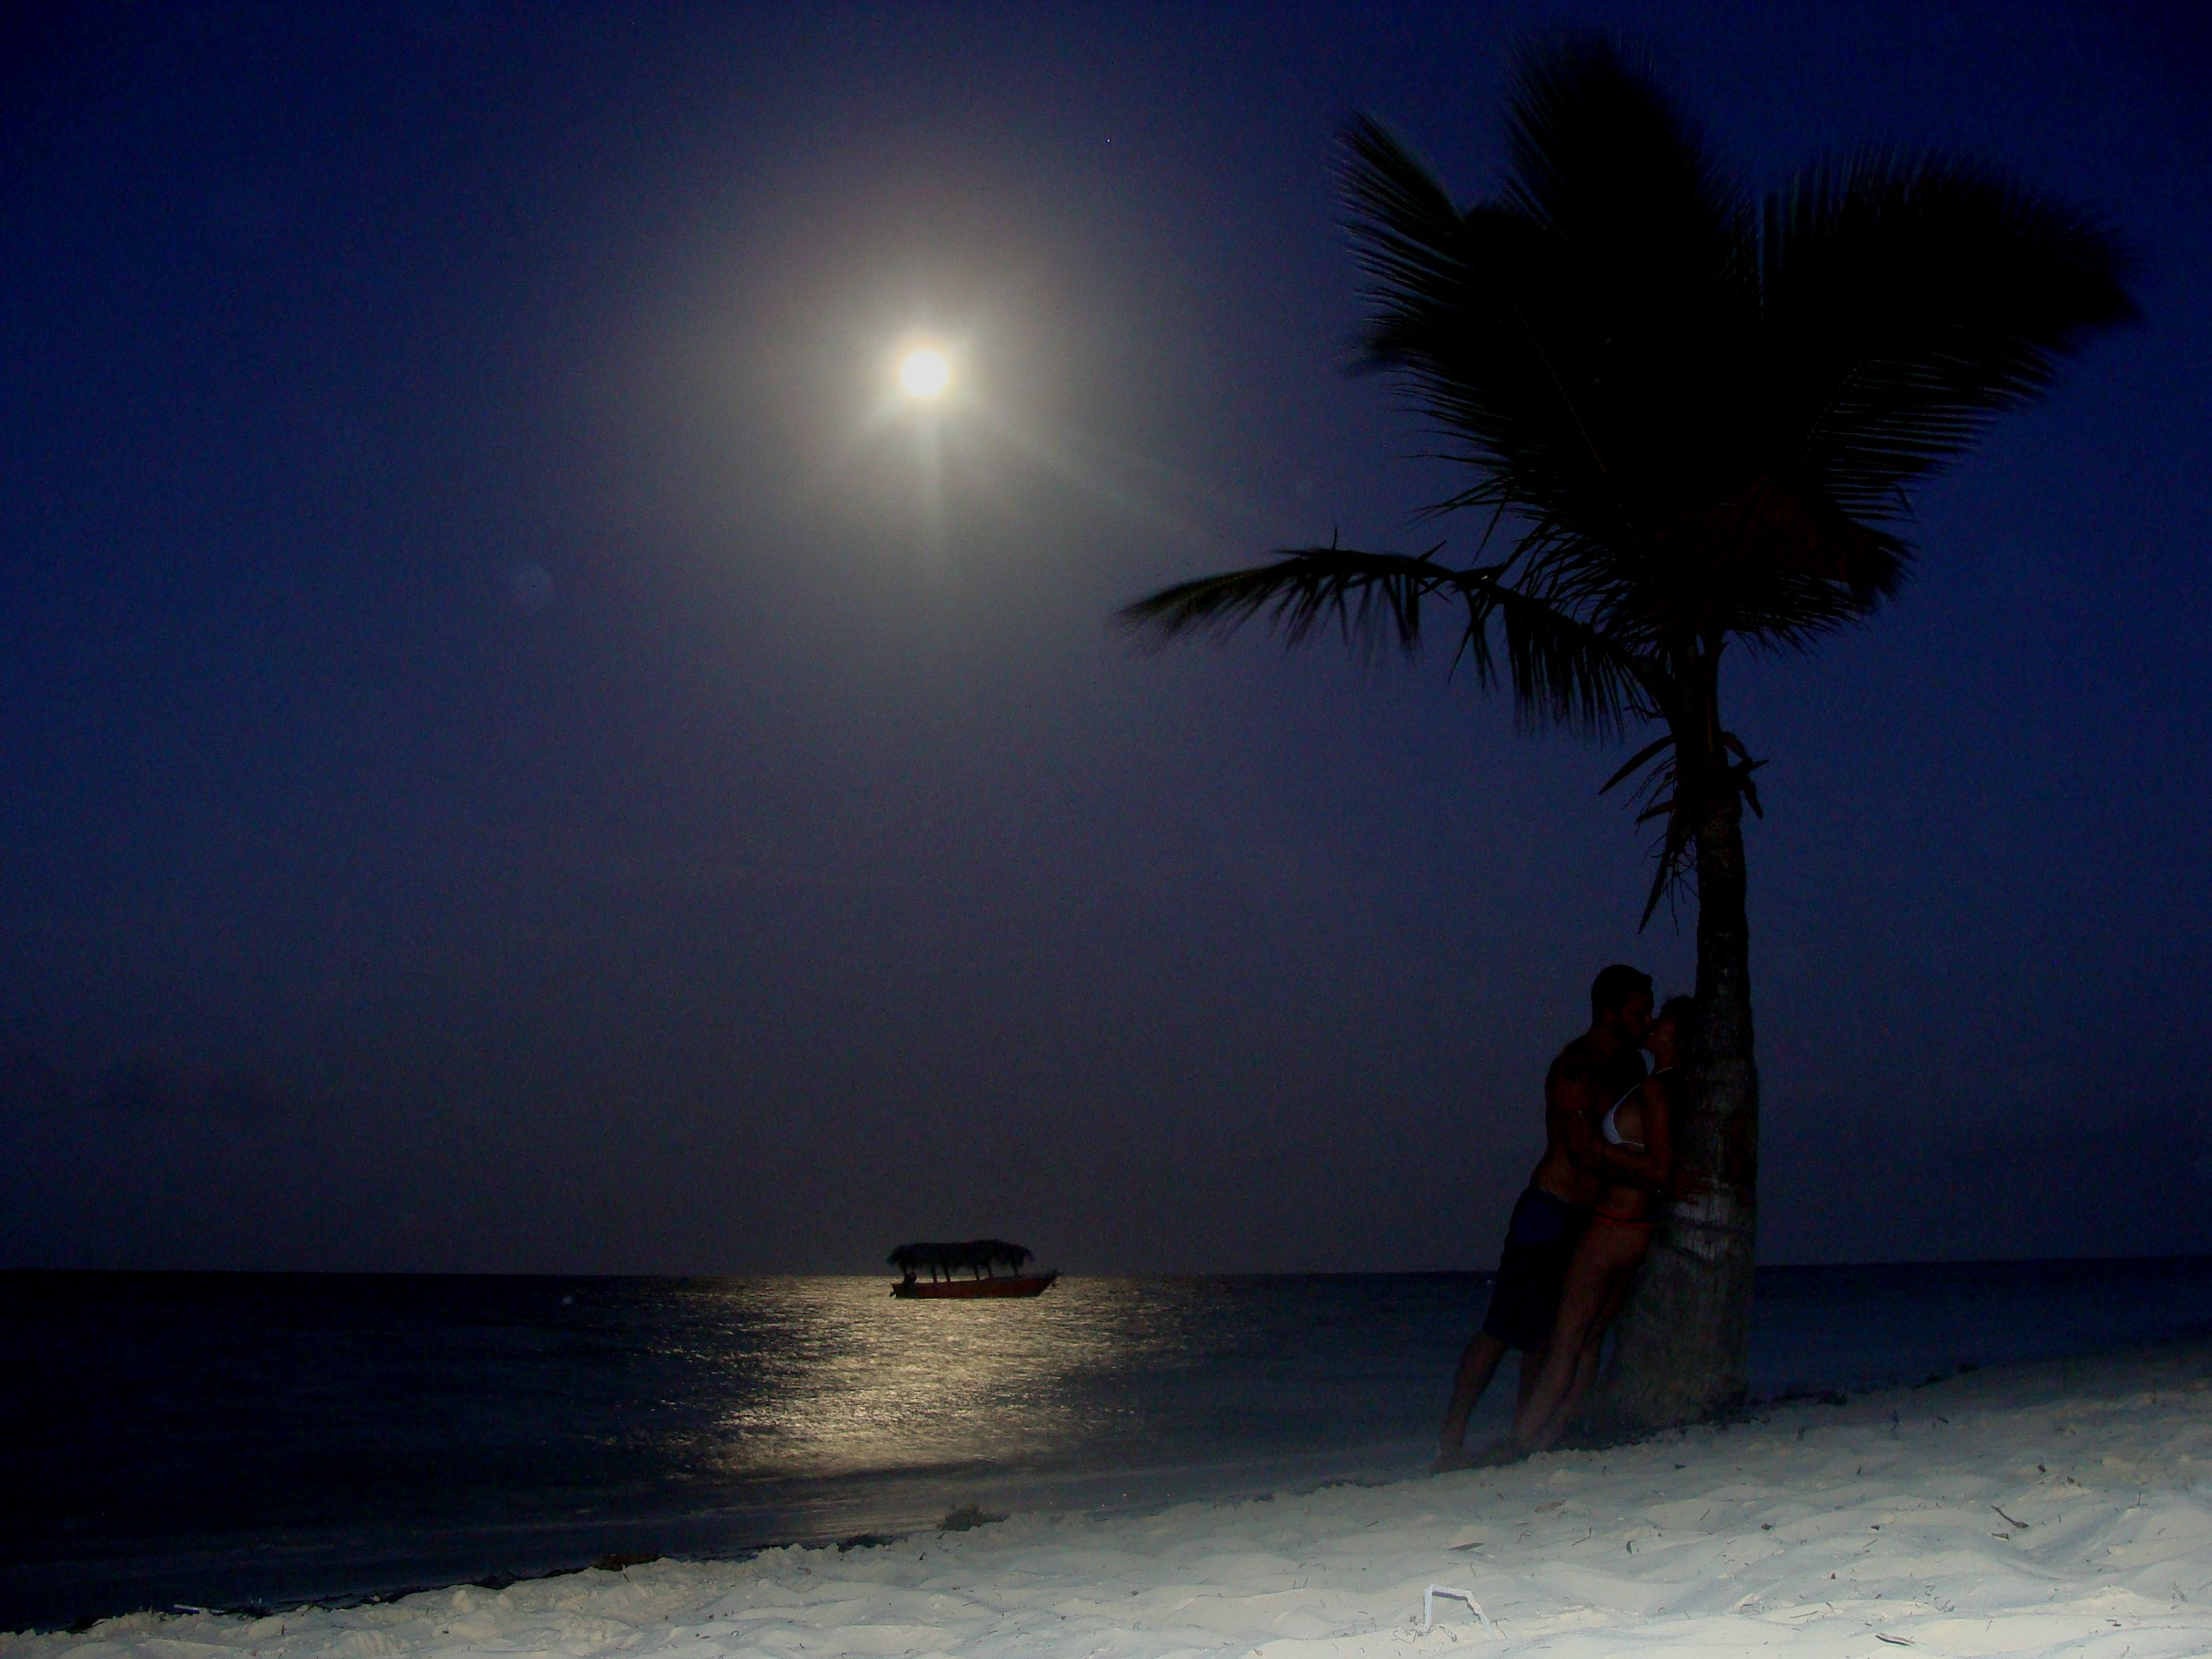 Noche De Playa Bavaro Punta Cana Rep Blica Dominicana  # Muebles Bavaro Punta Cana